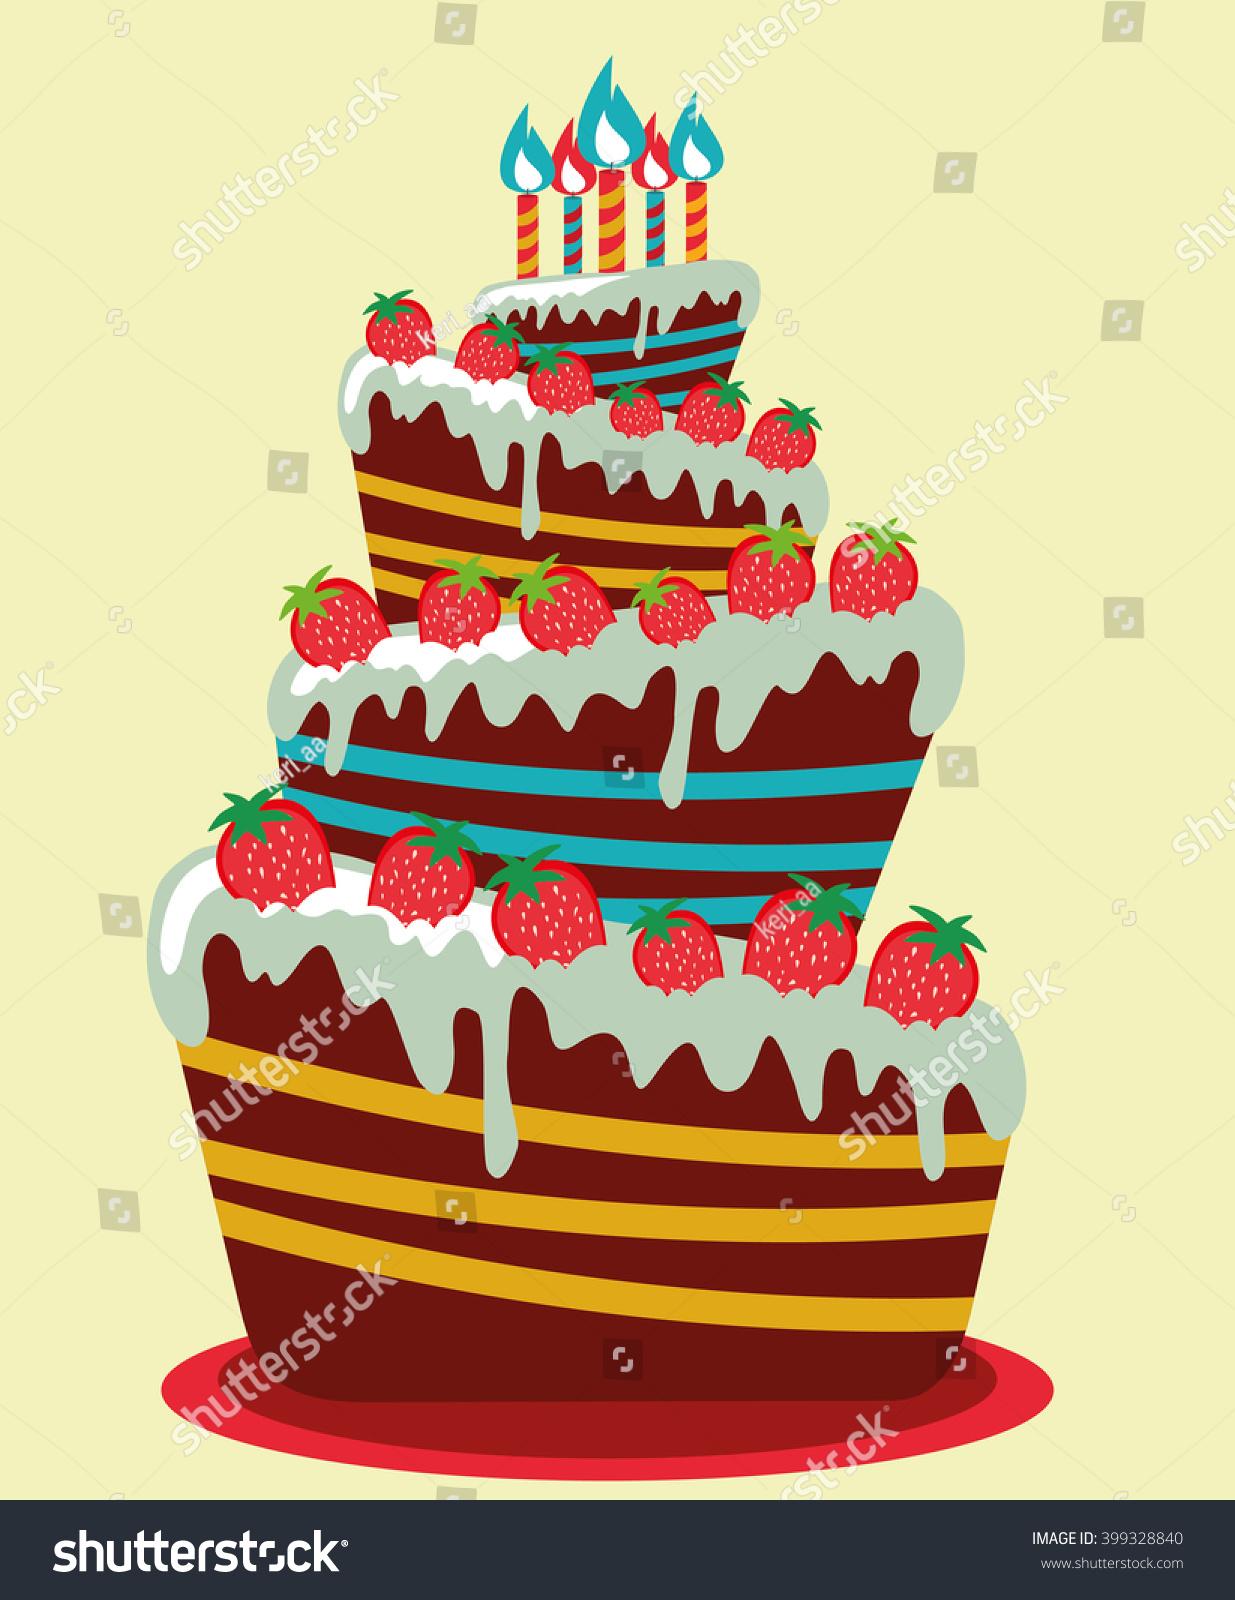 Happy birthday card birthday cake colorful stock vector 399328840 happy birthday card birthday cake colorful birthday vector illustration kristyandbryce Image collections